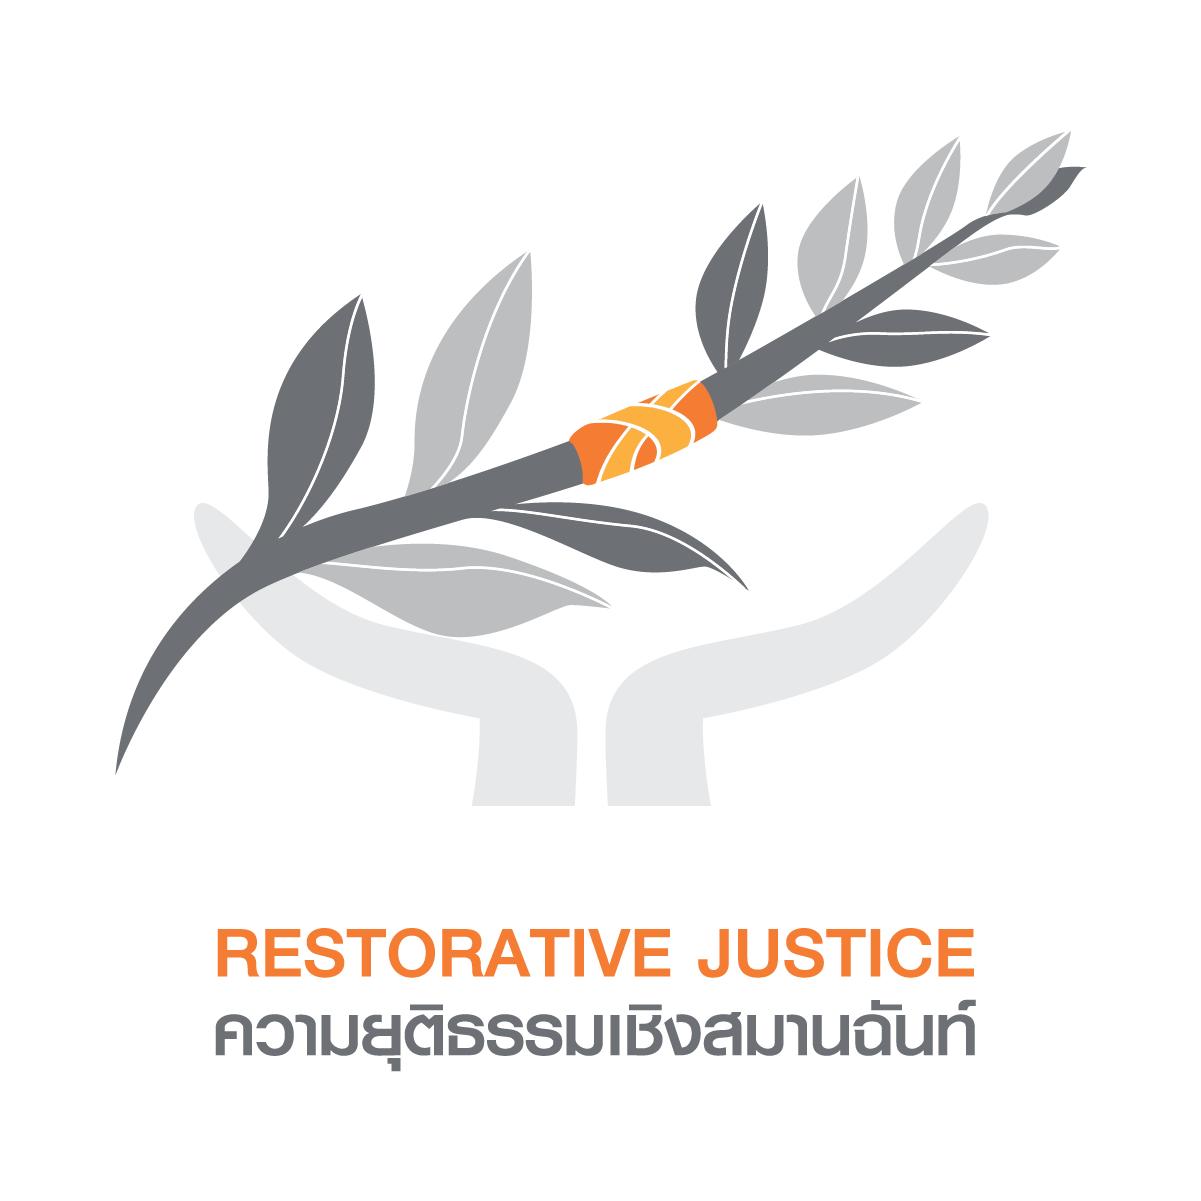 National Symposium on Restorative Justice